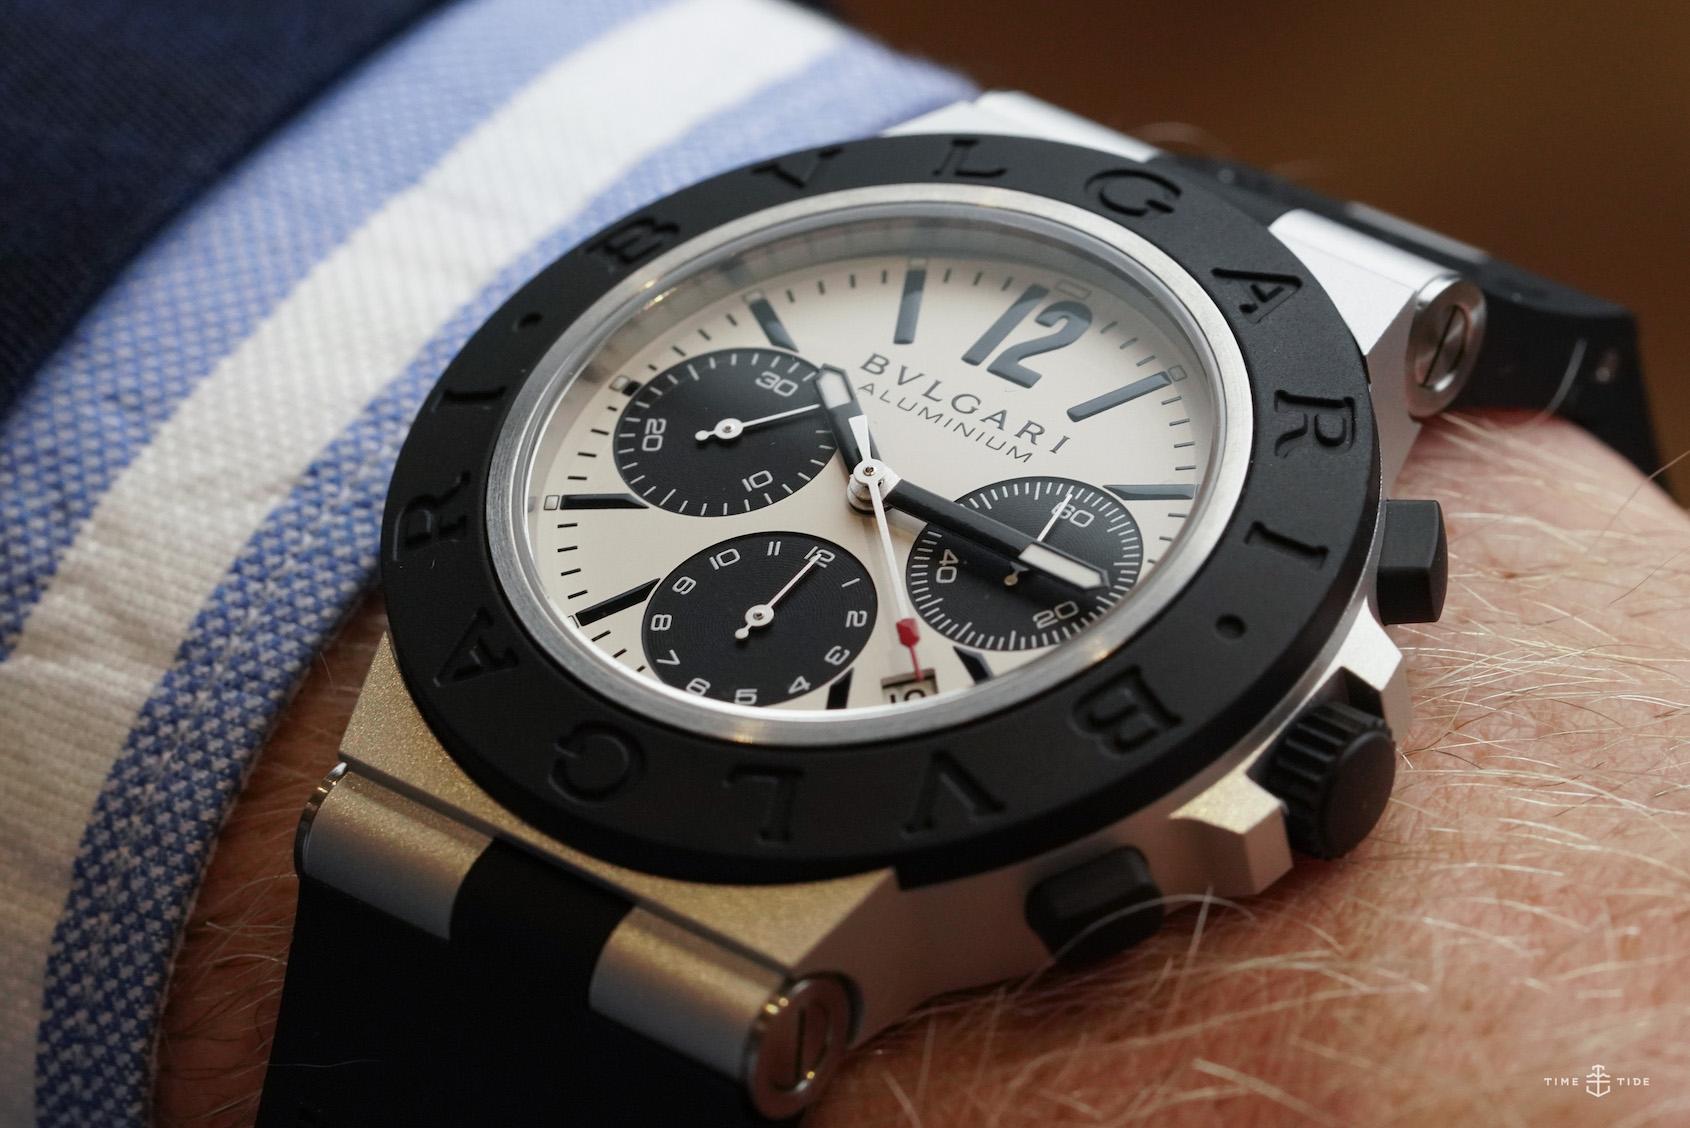 HANDS-ON: The lightweight luxury of the new Bulgari Aluminium collection